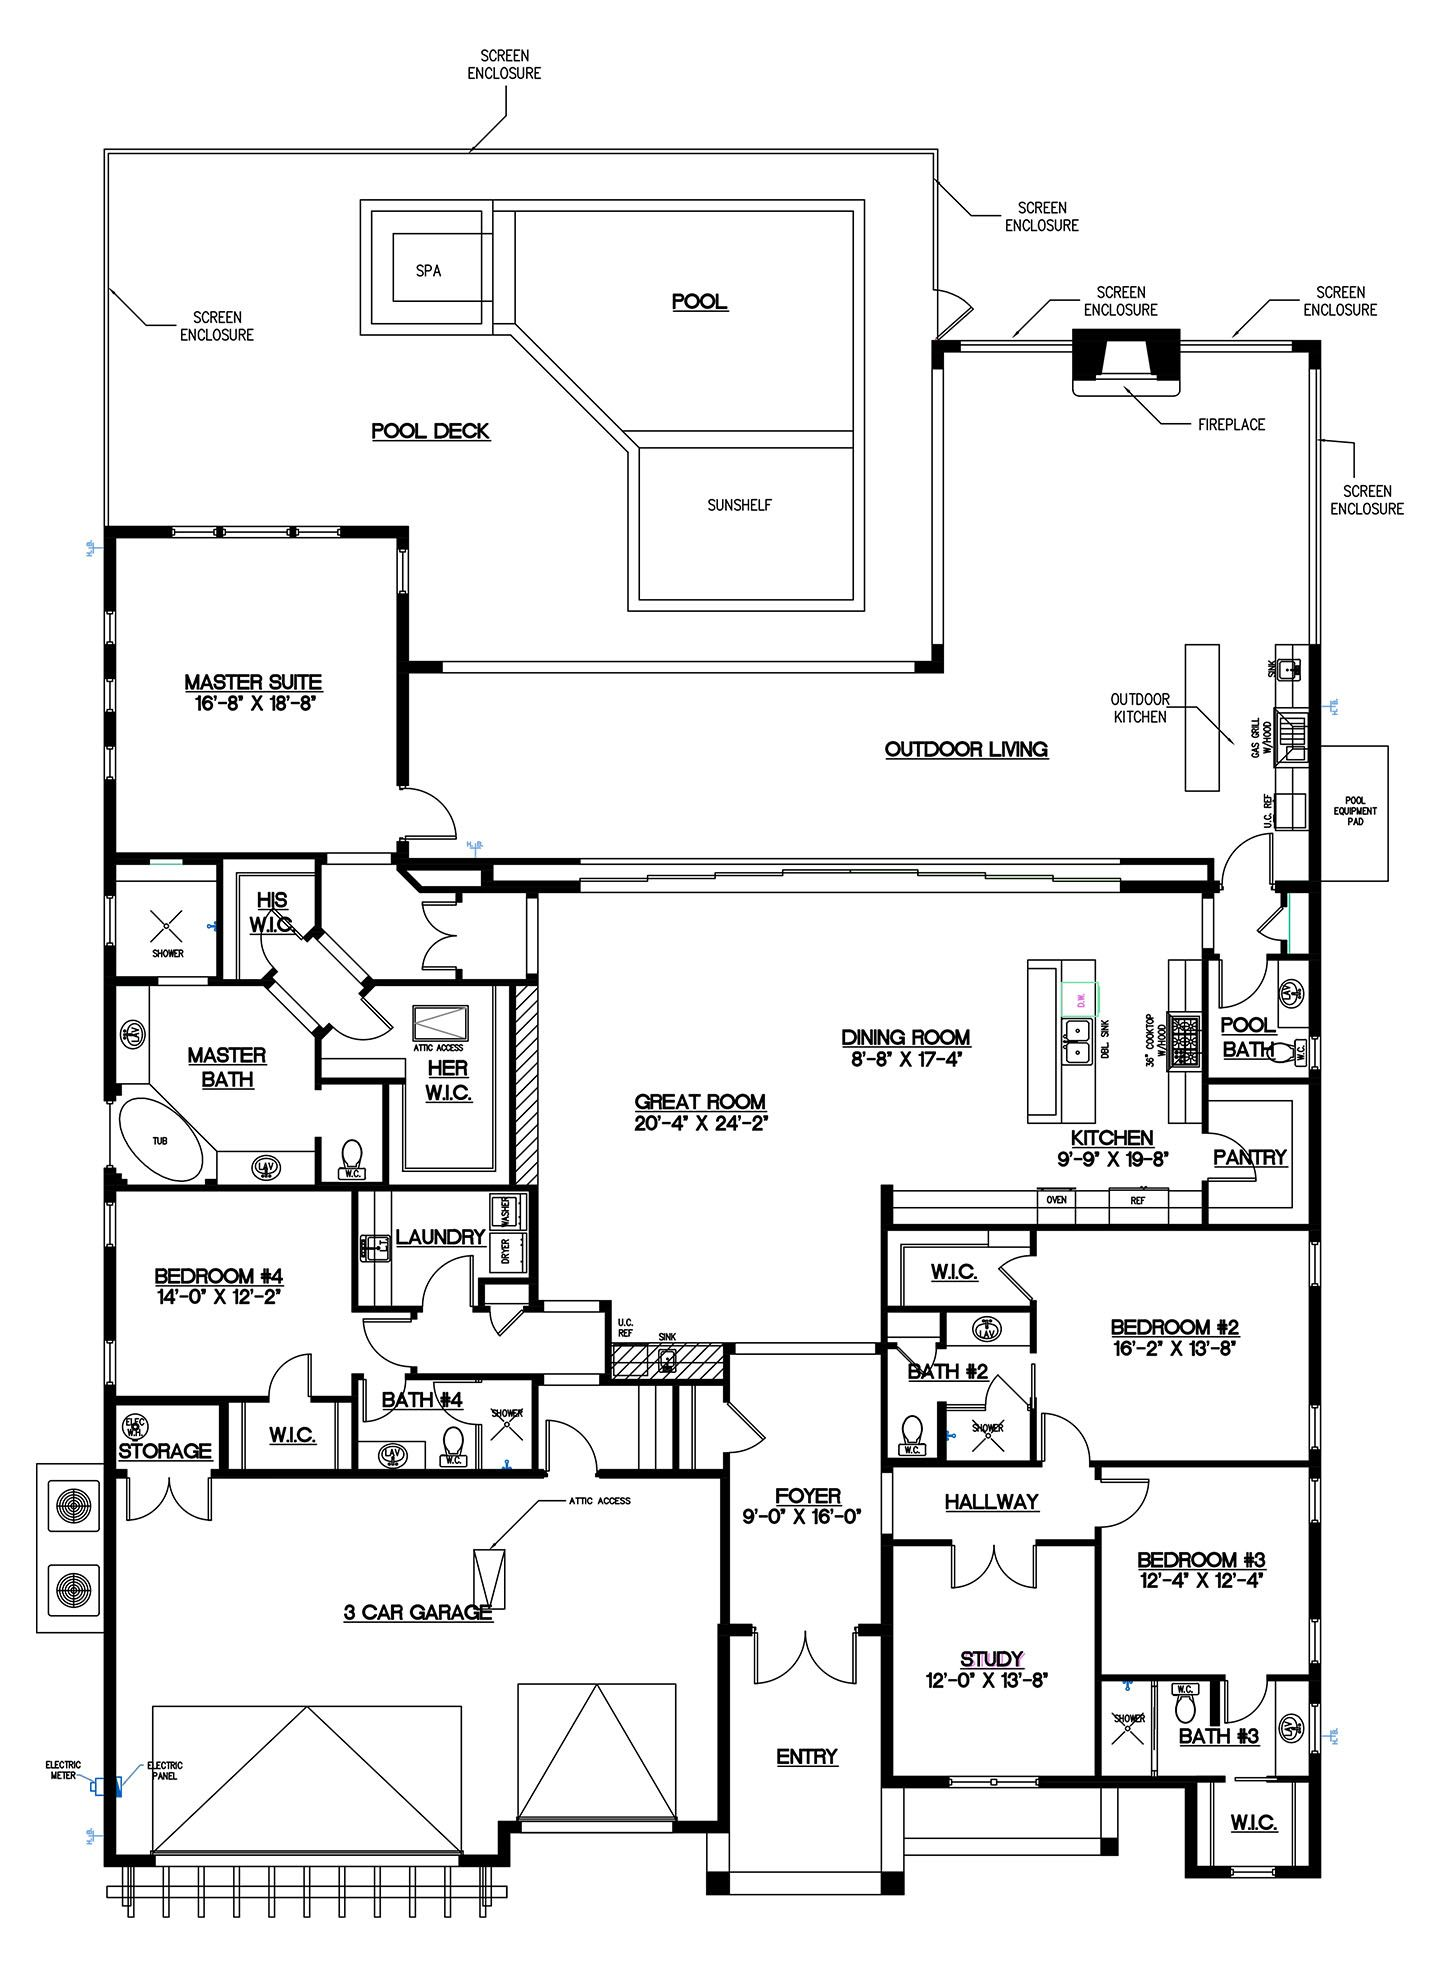 Mcgarvey Homes High Tide Floor Plan In Naples Reserve Naples Florida New Construction Homes